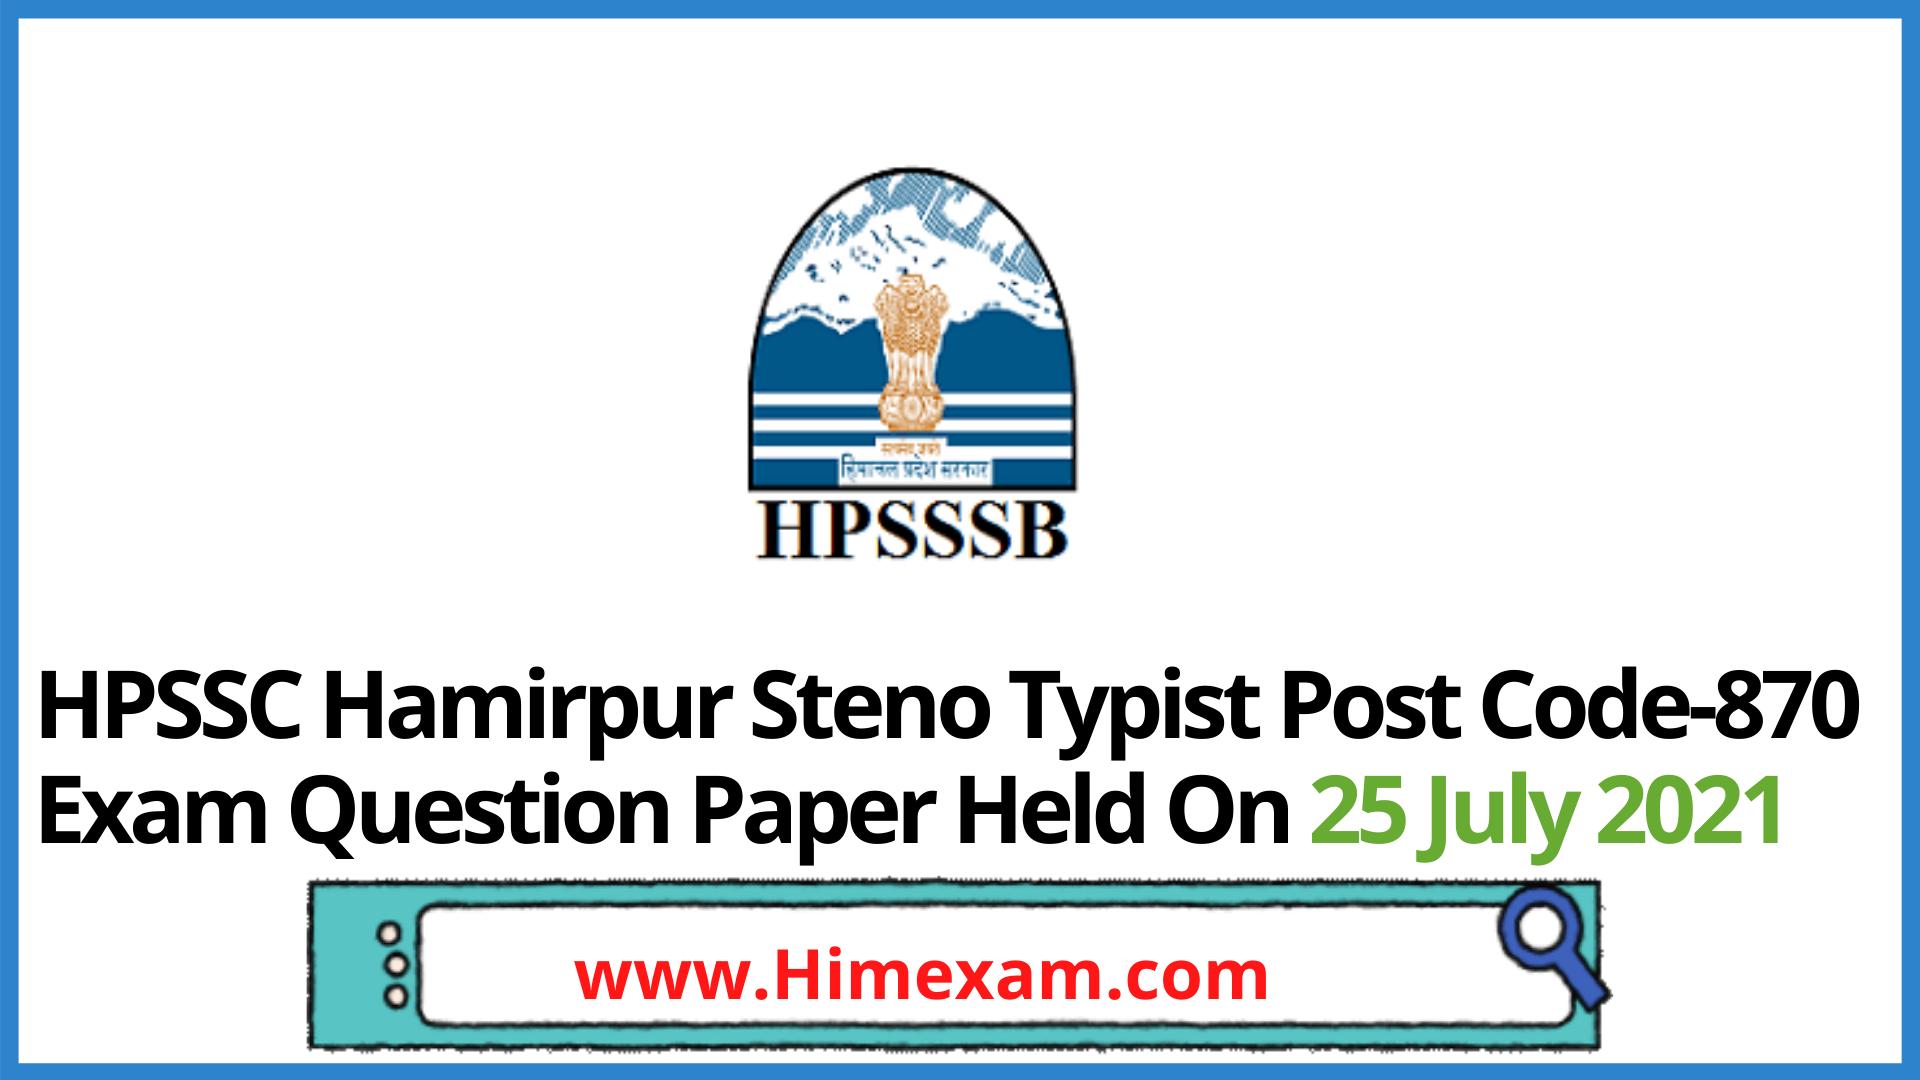 HPSSC Hamirpur Steno Typist  Post Code-870 Exam Question Paper Held On 25 July 2021